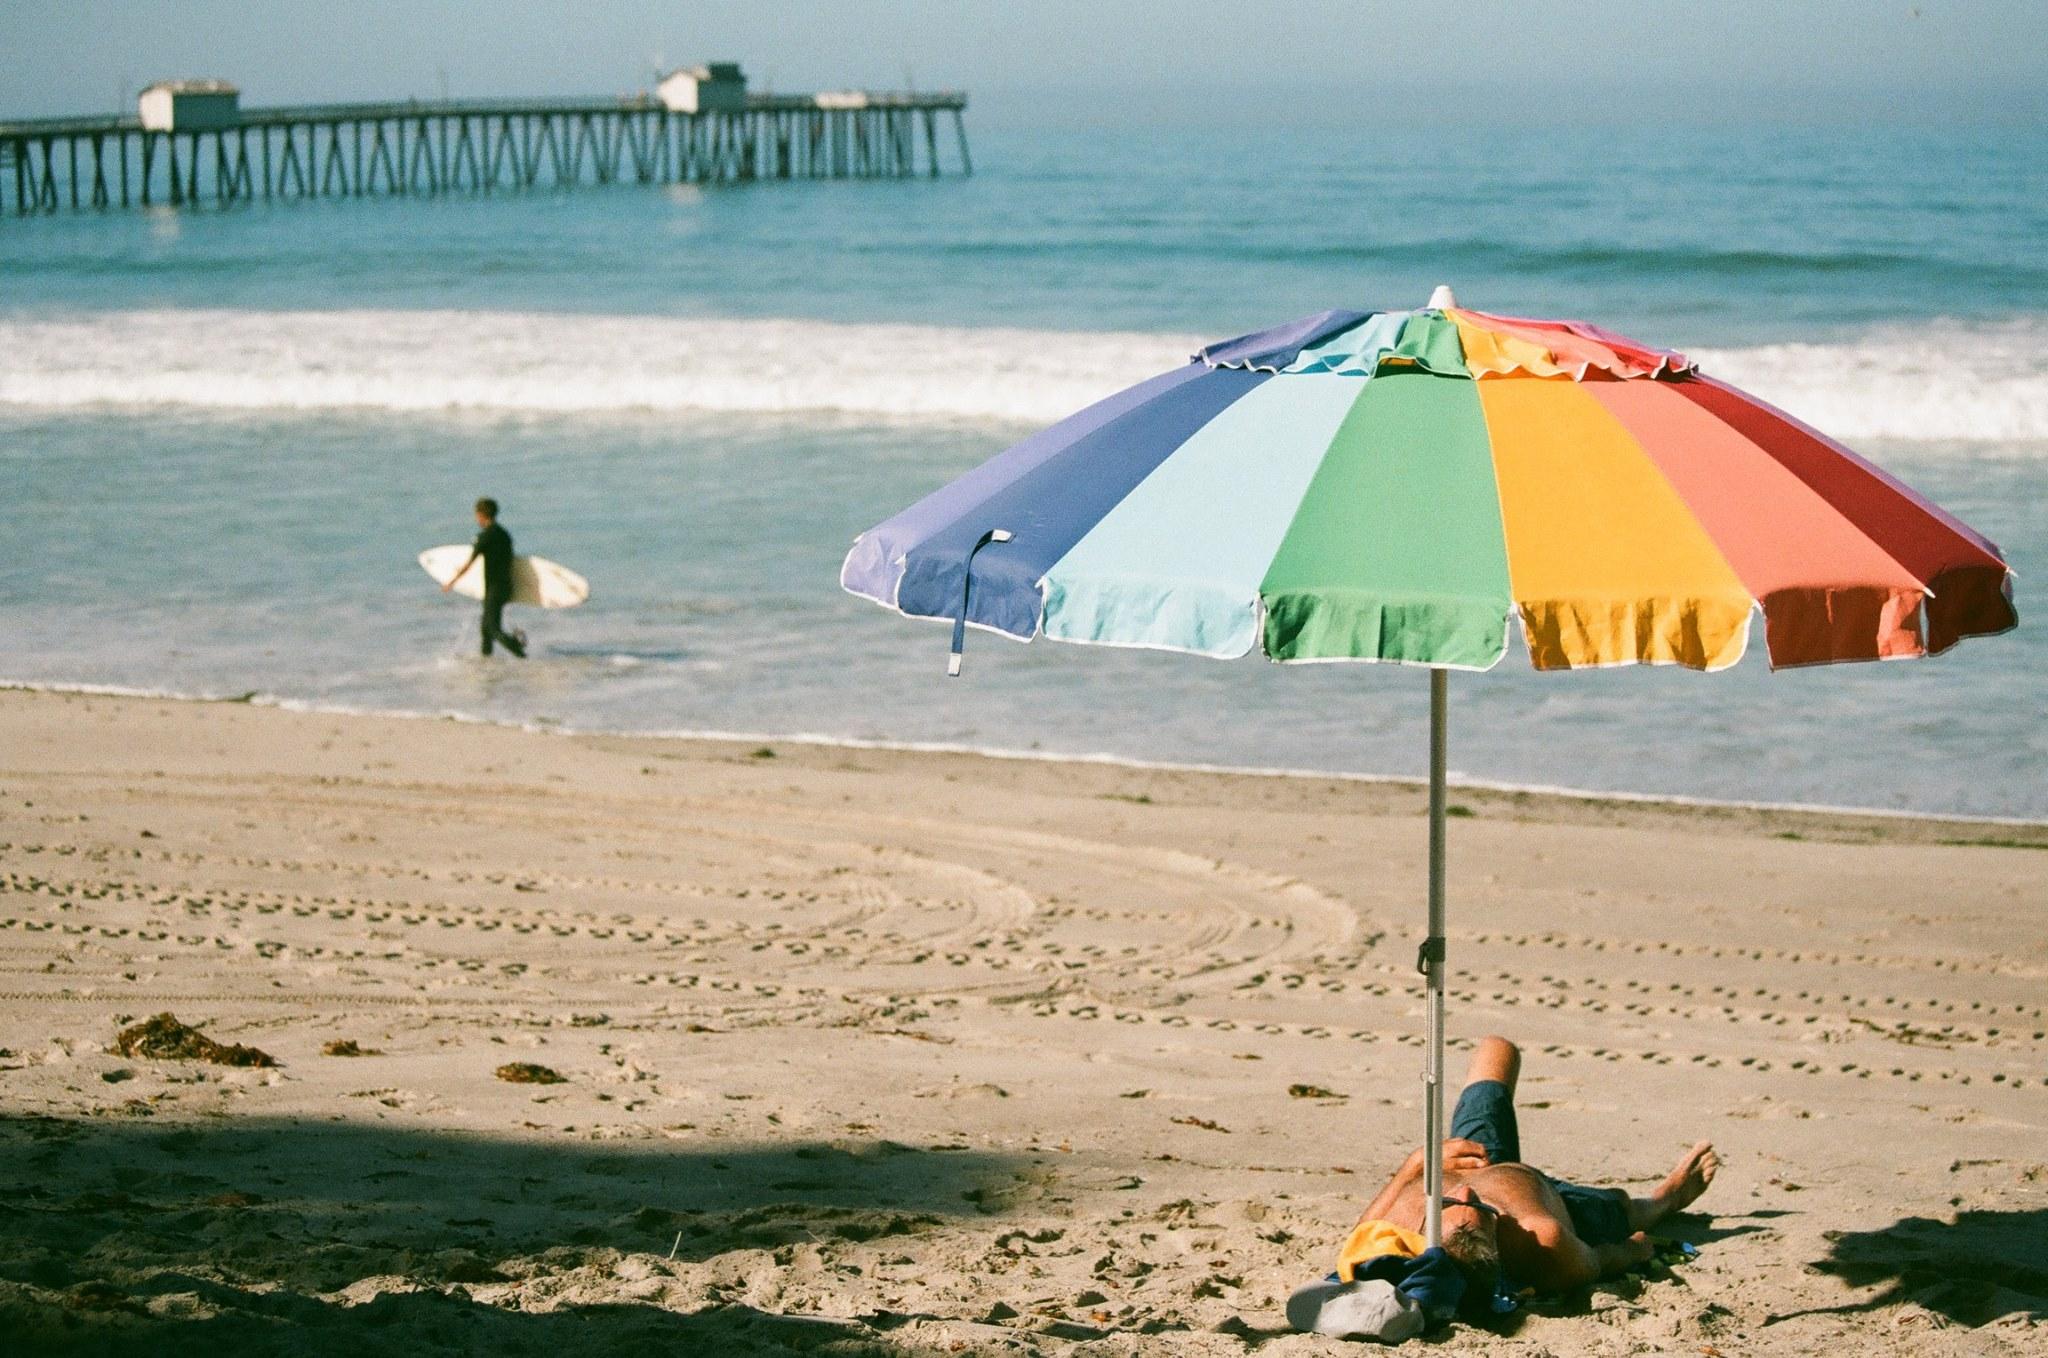 Fujicolor Canon 1V — at San Clemente Beach and Pier